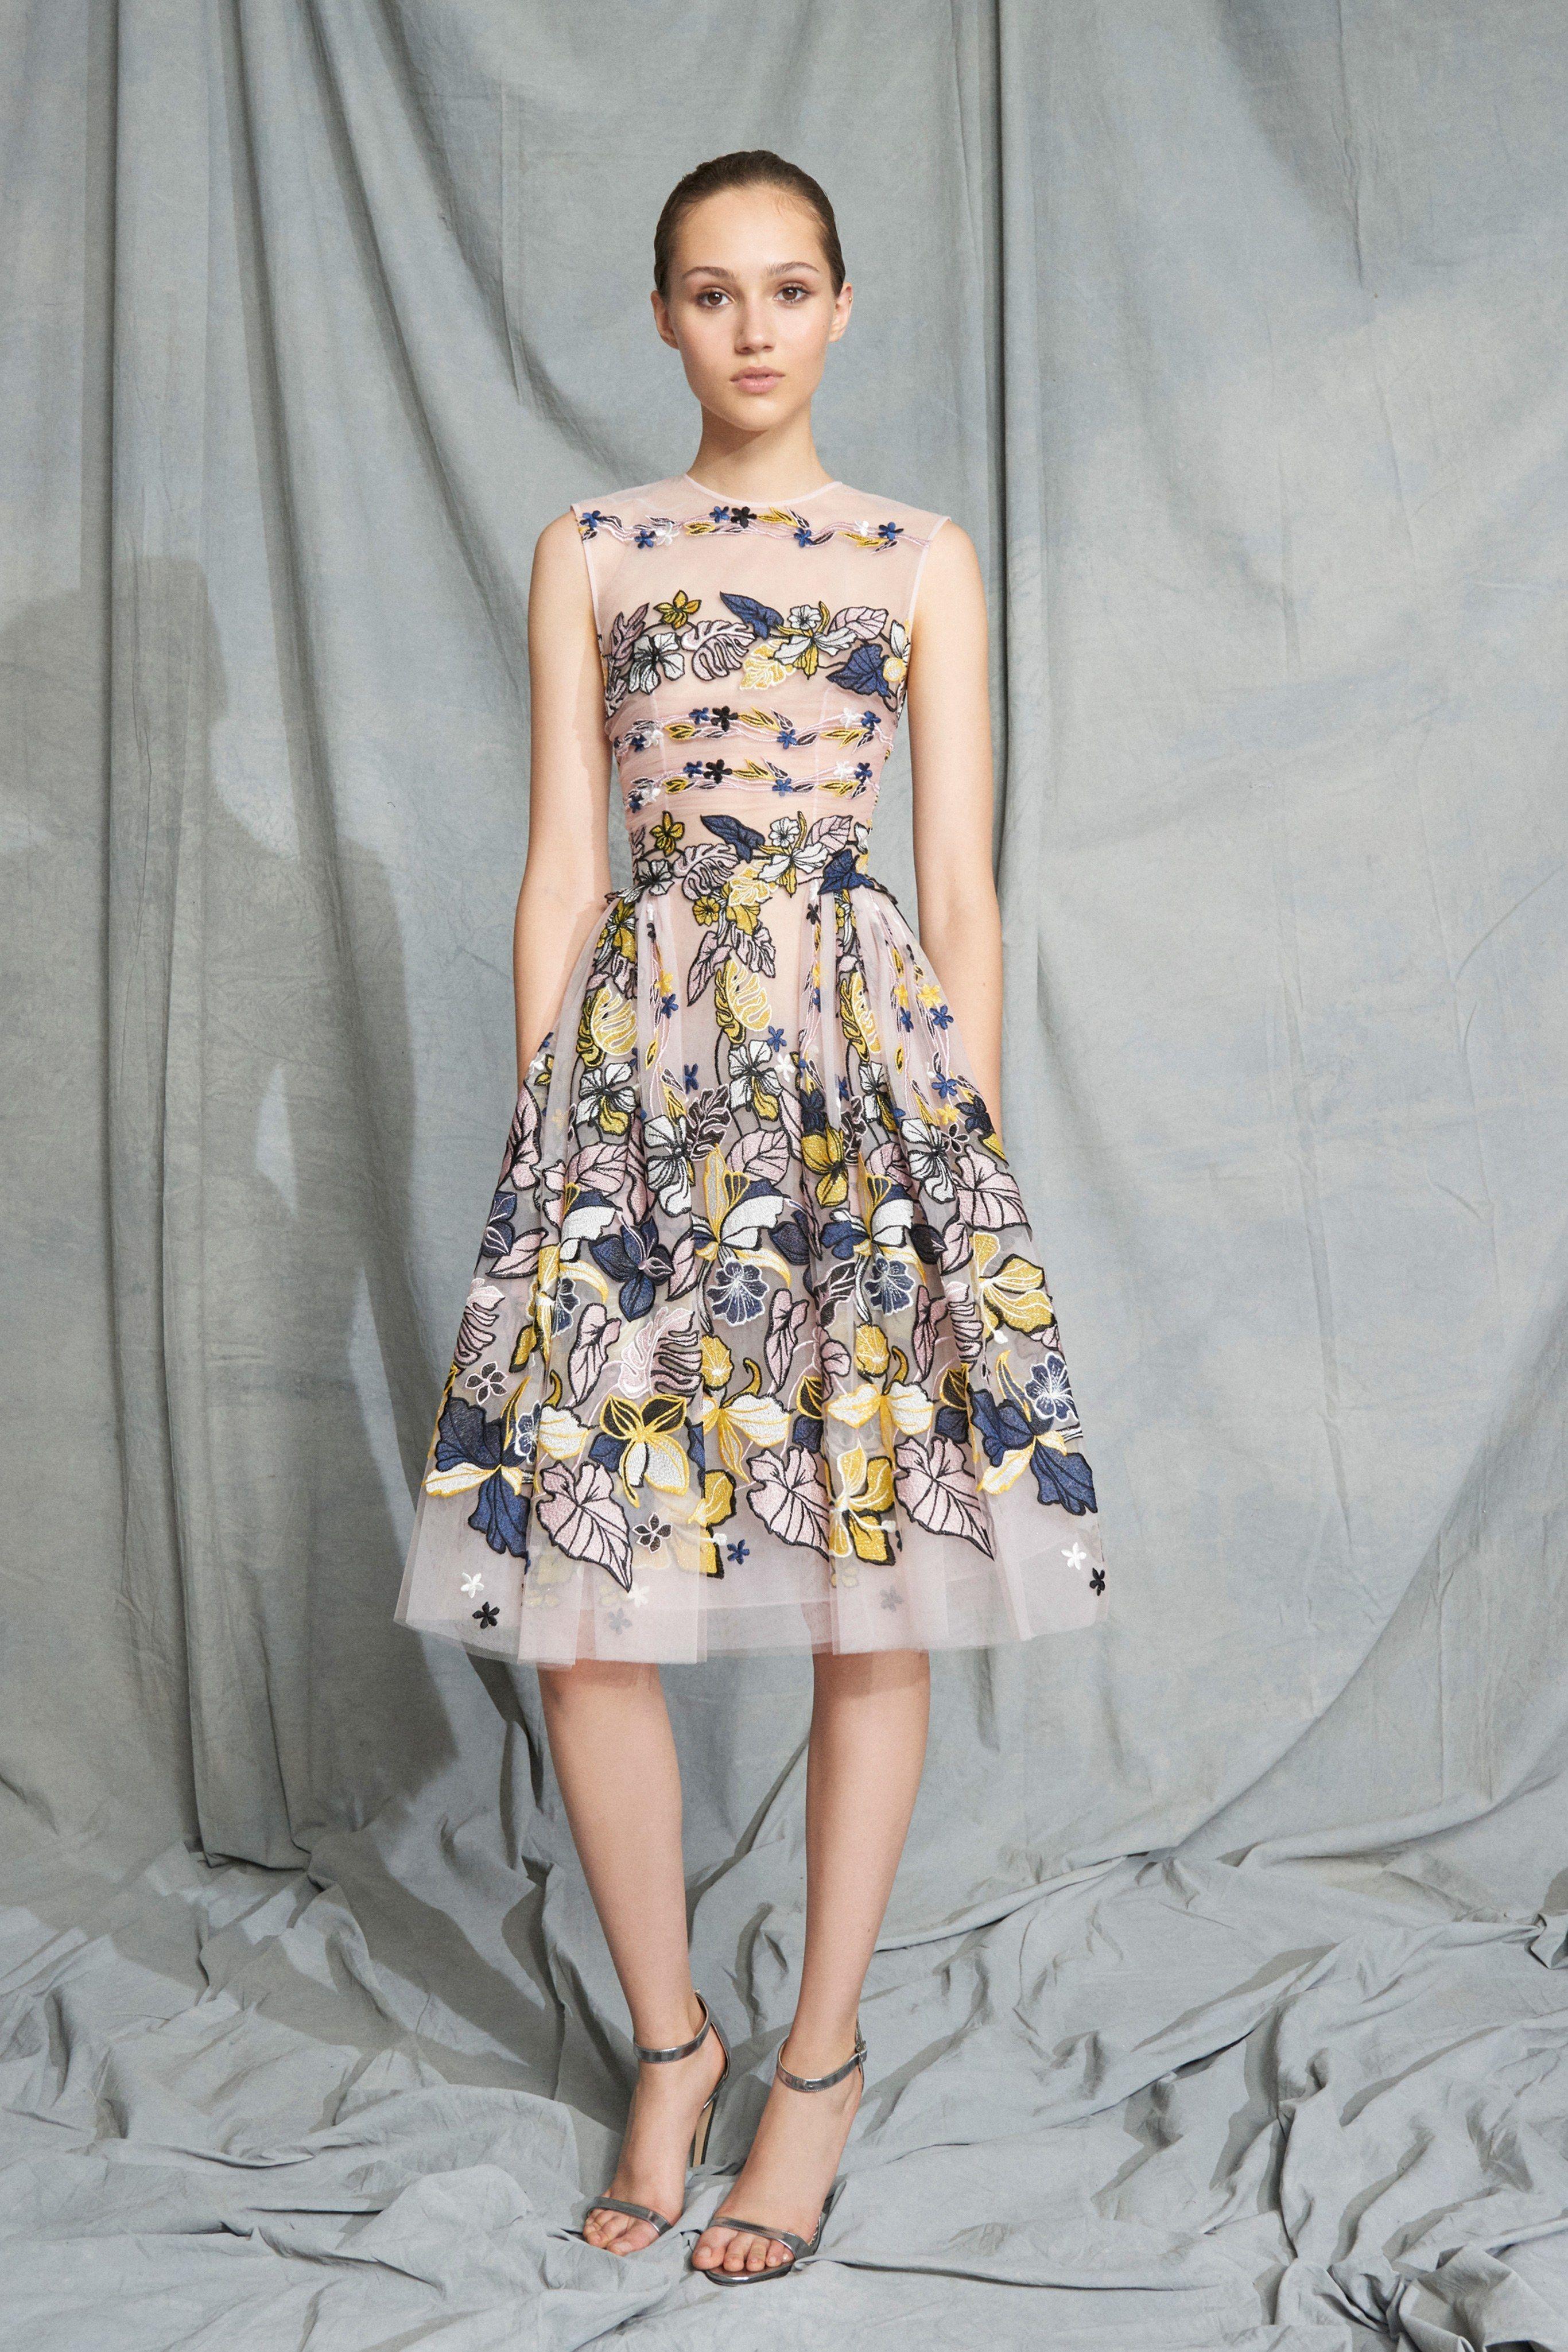 407656c47a58 Zuhair Murad Resort 2019 Paris Collection - Vogue #clothes  #beautifulclothes #fashion #apparel